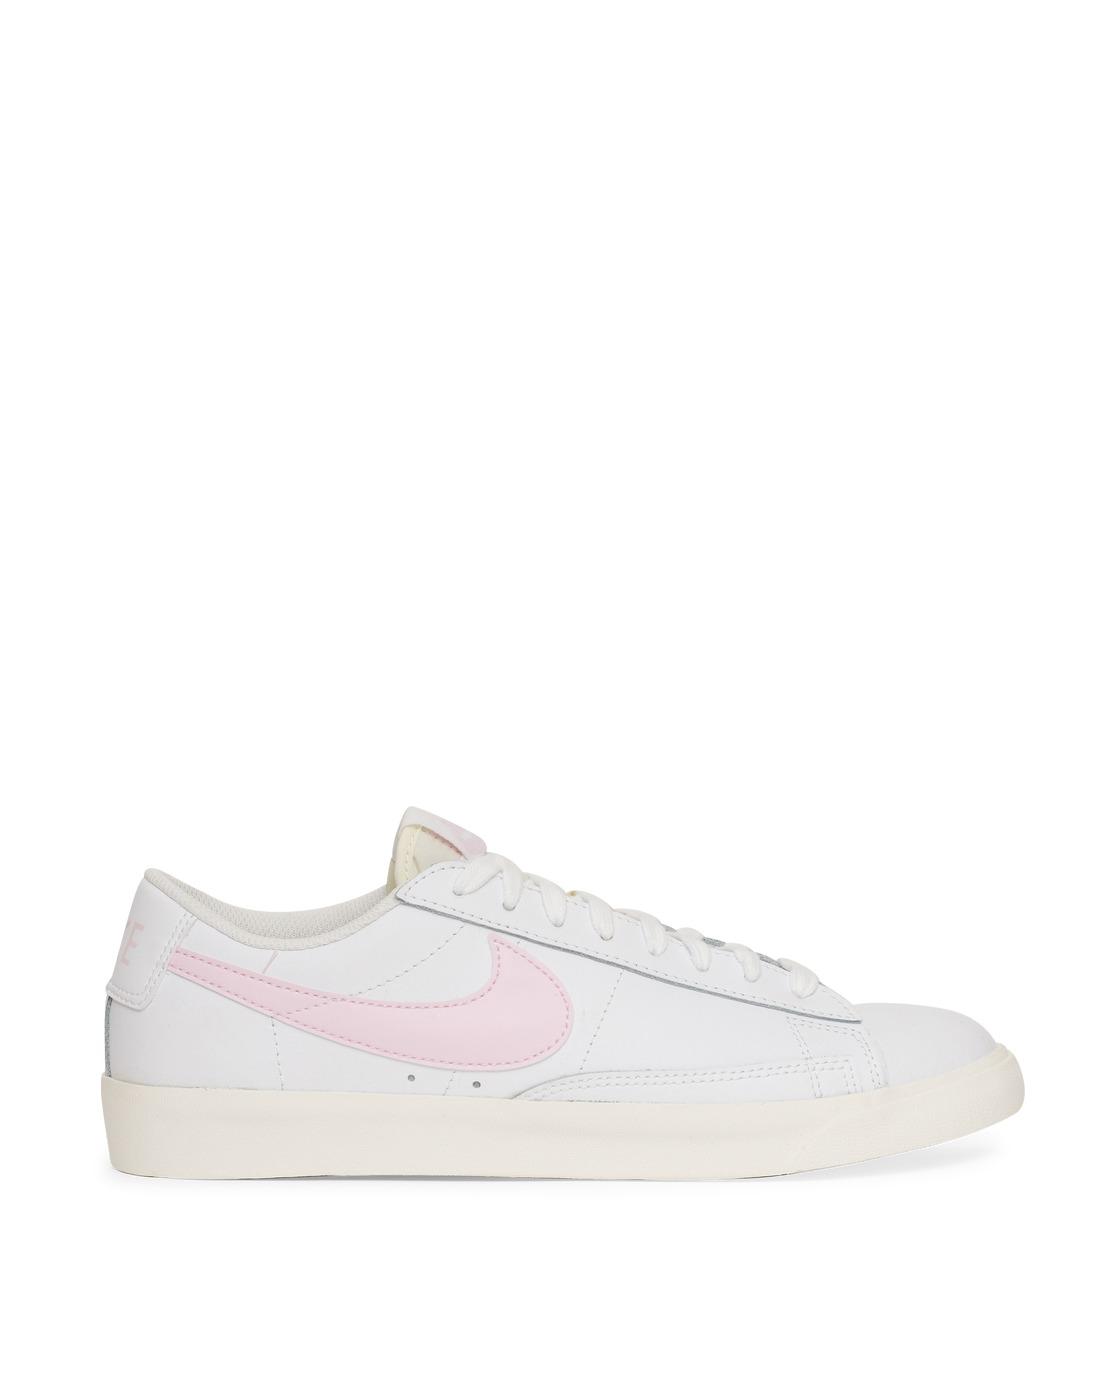 Photo: Nike Blazer Low Sneakers White/Pink Foam